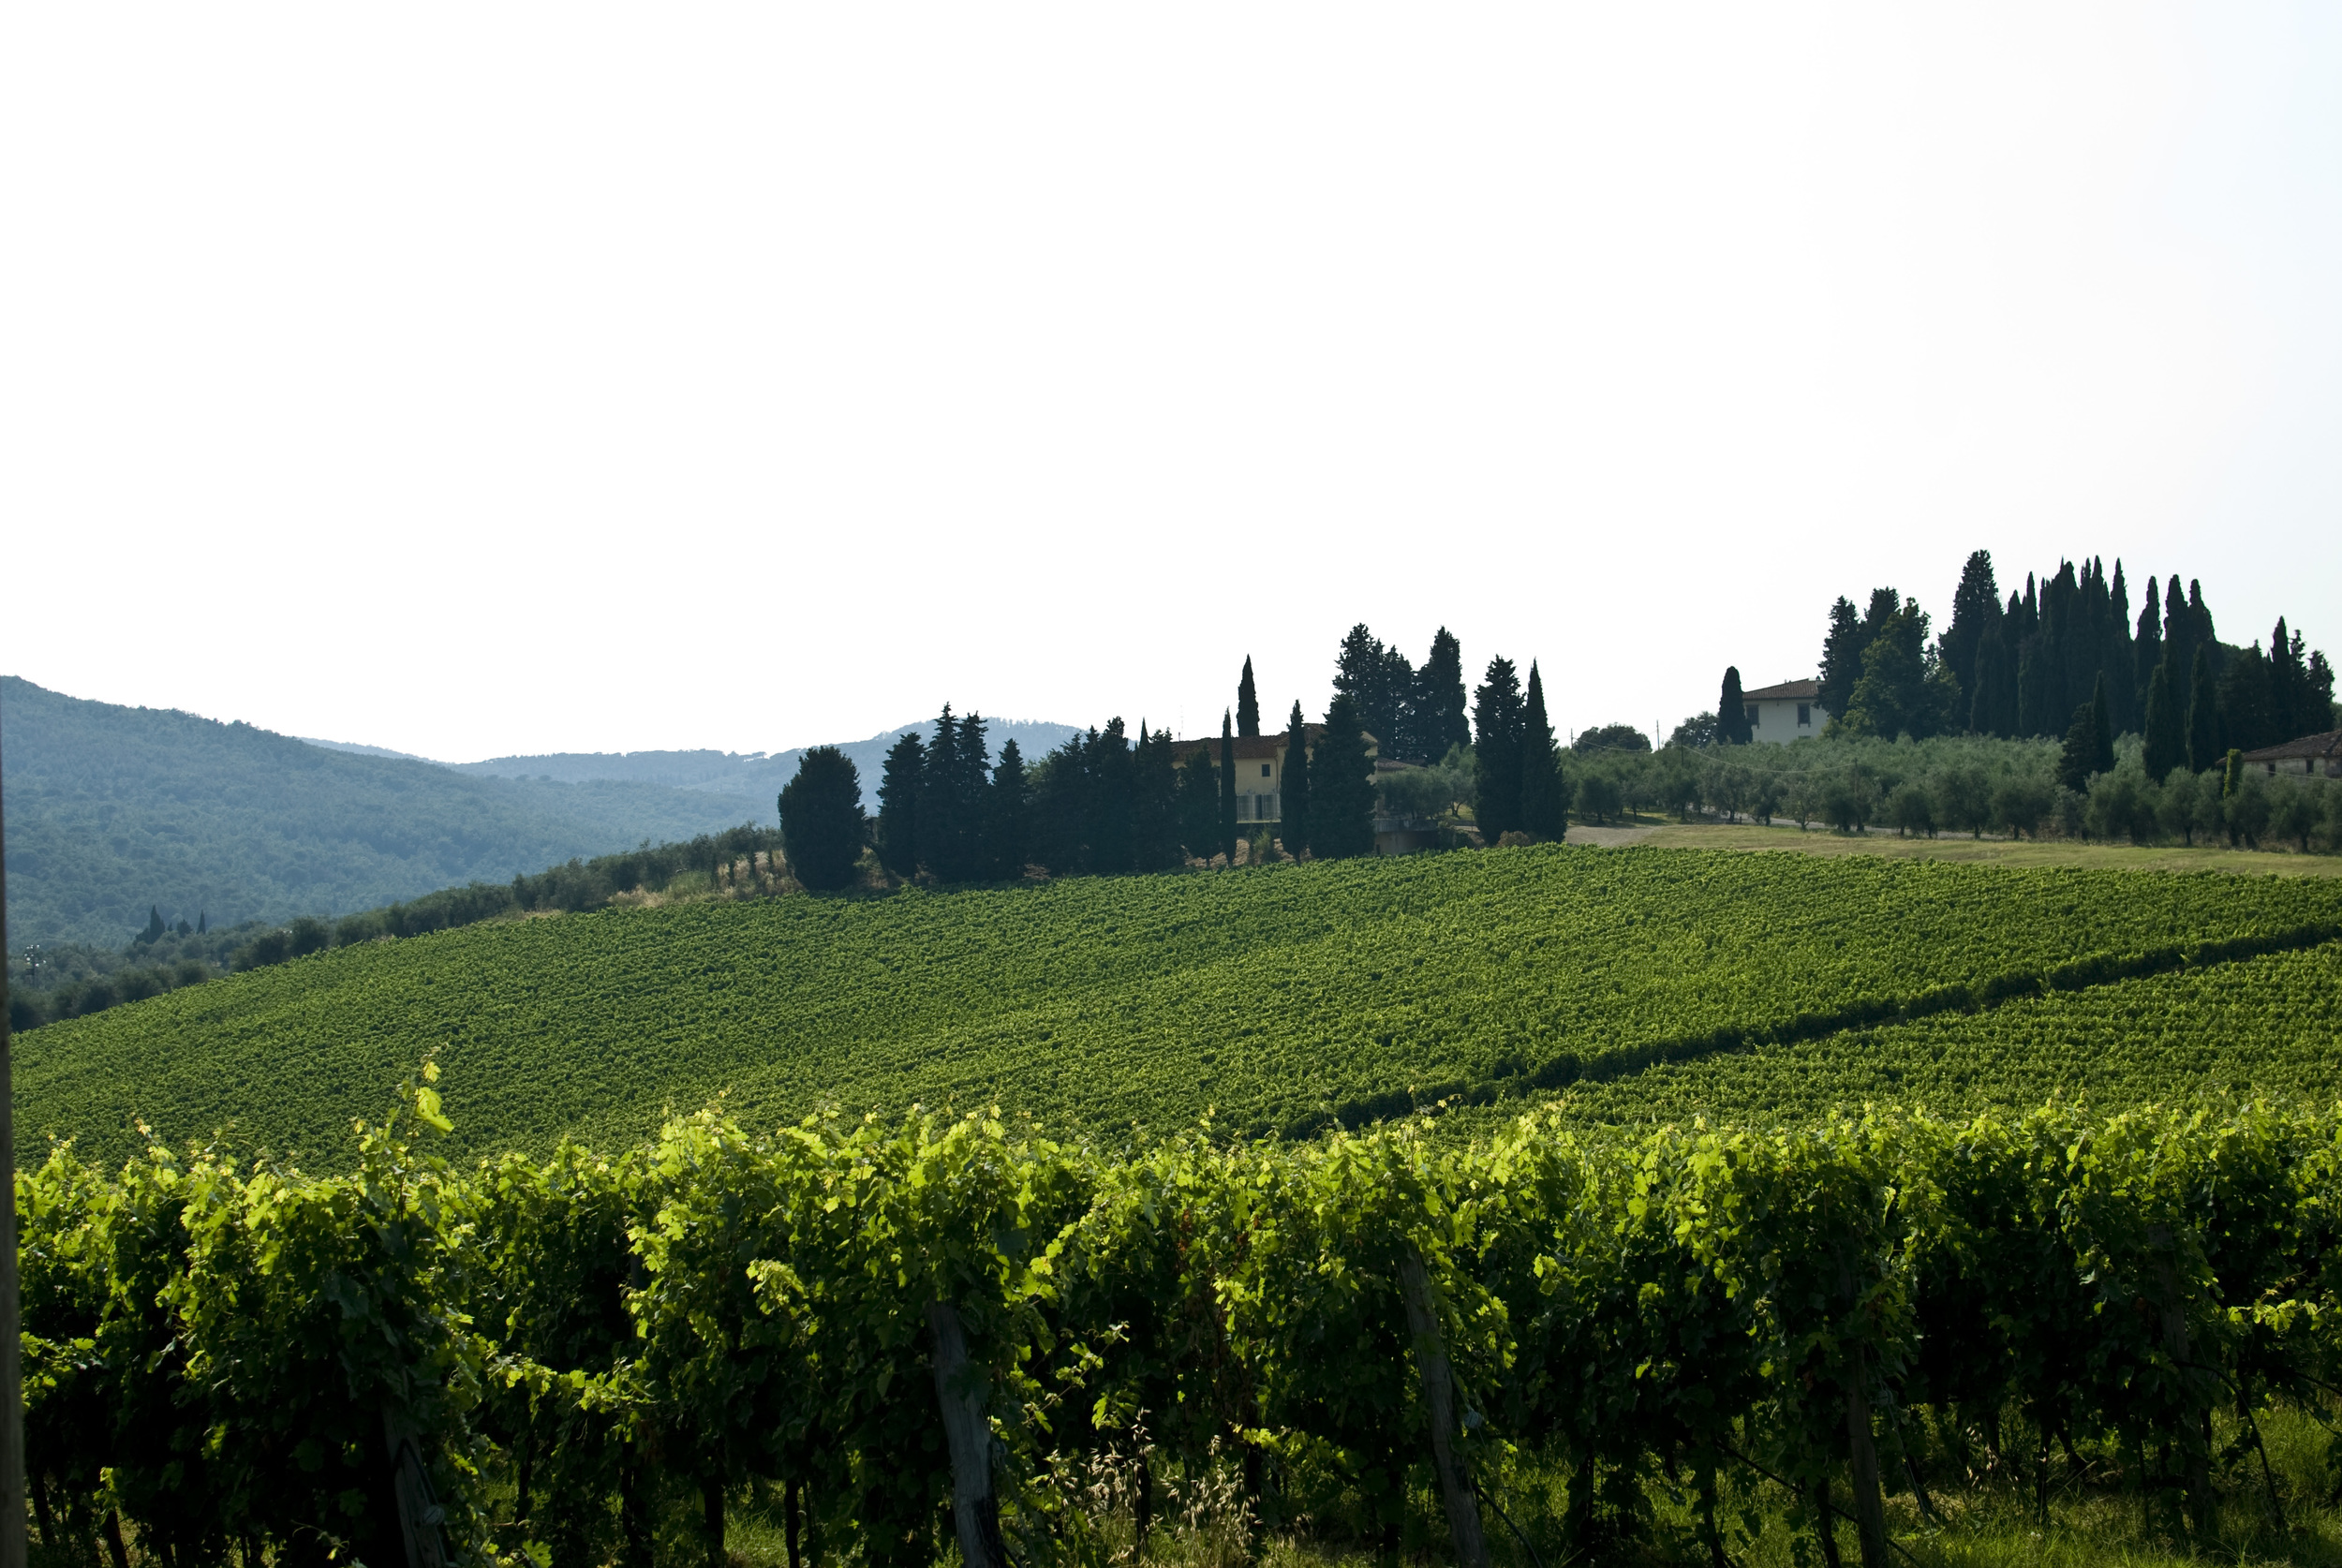 tuscany_4797892158_o.jpg